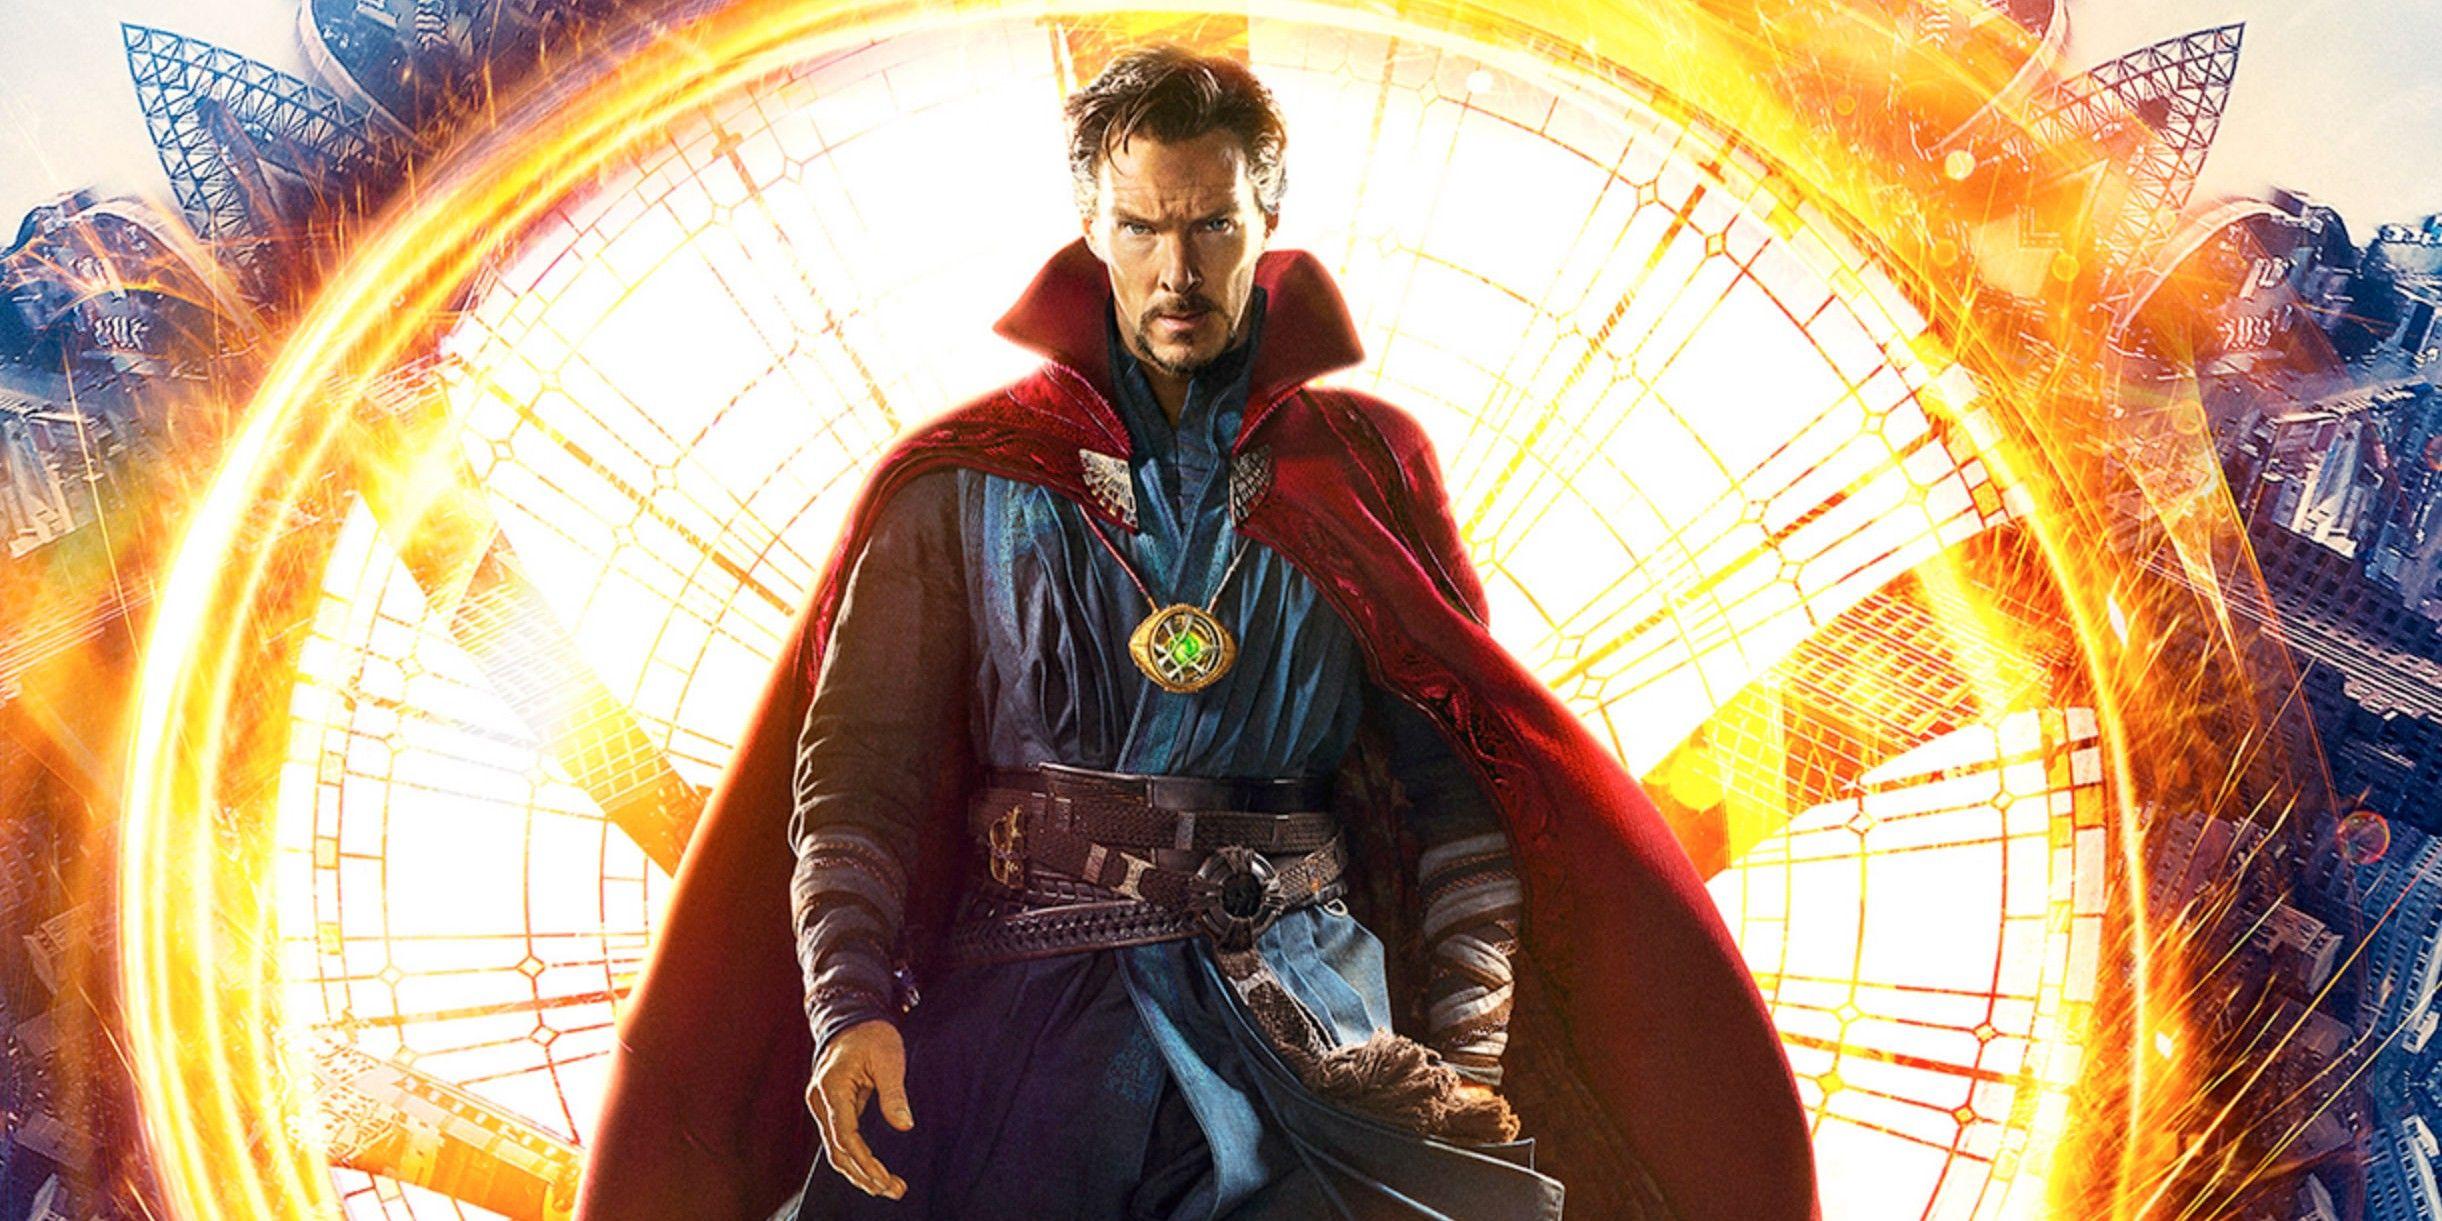 Doctor Strange in the Multiverse of Madness: Começou as Filmagens esta semana confirma Kevin Feige 1